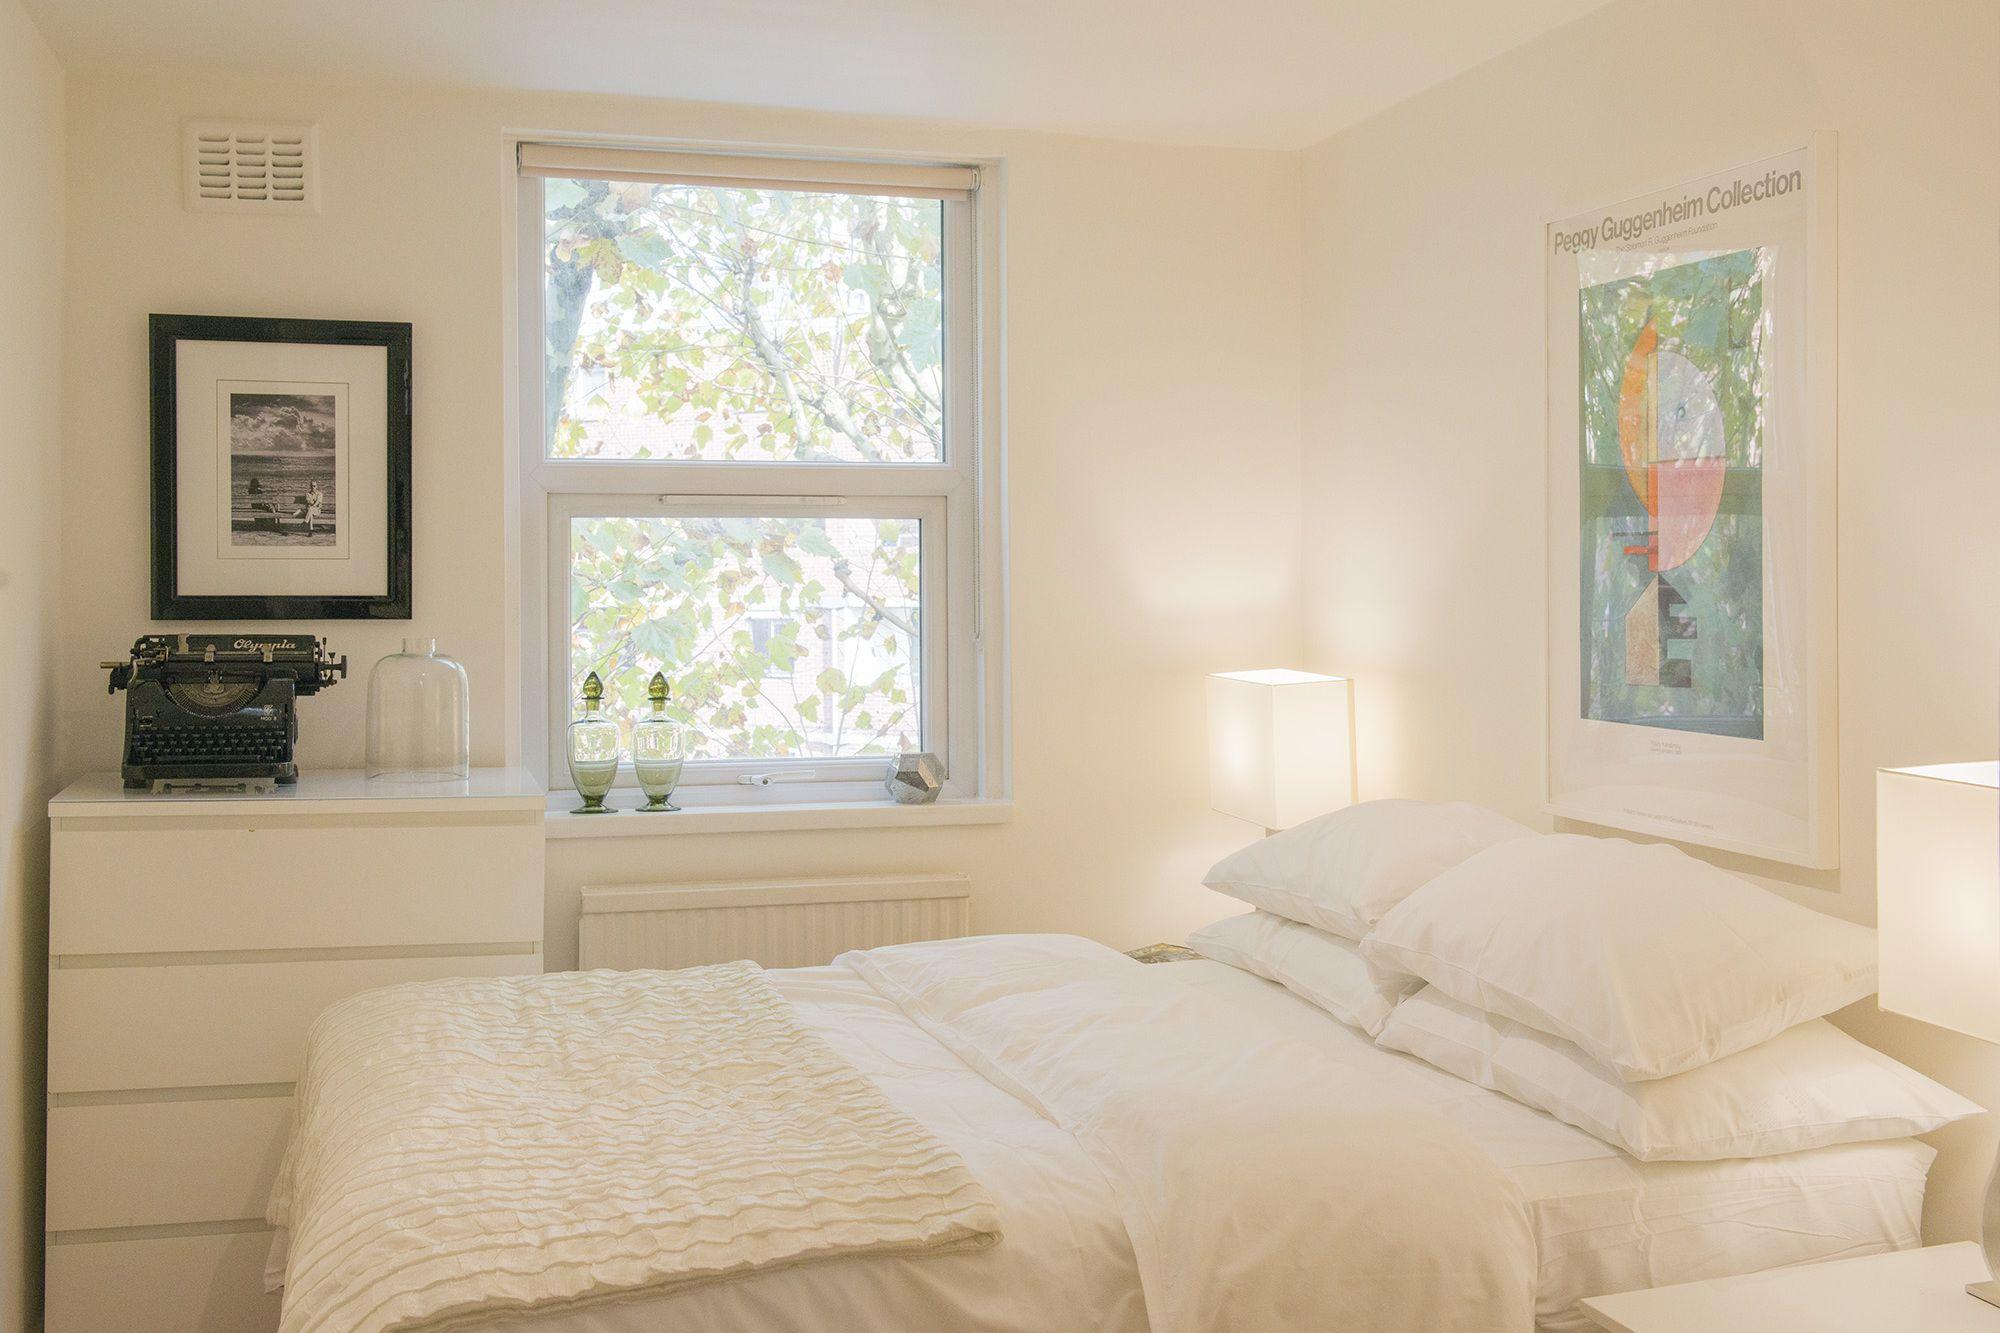 Bedroom303.jpg